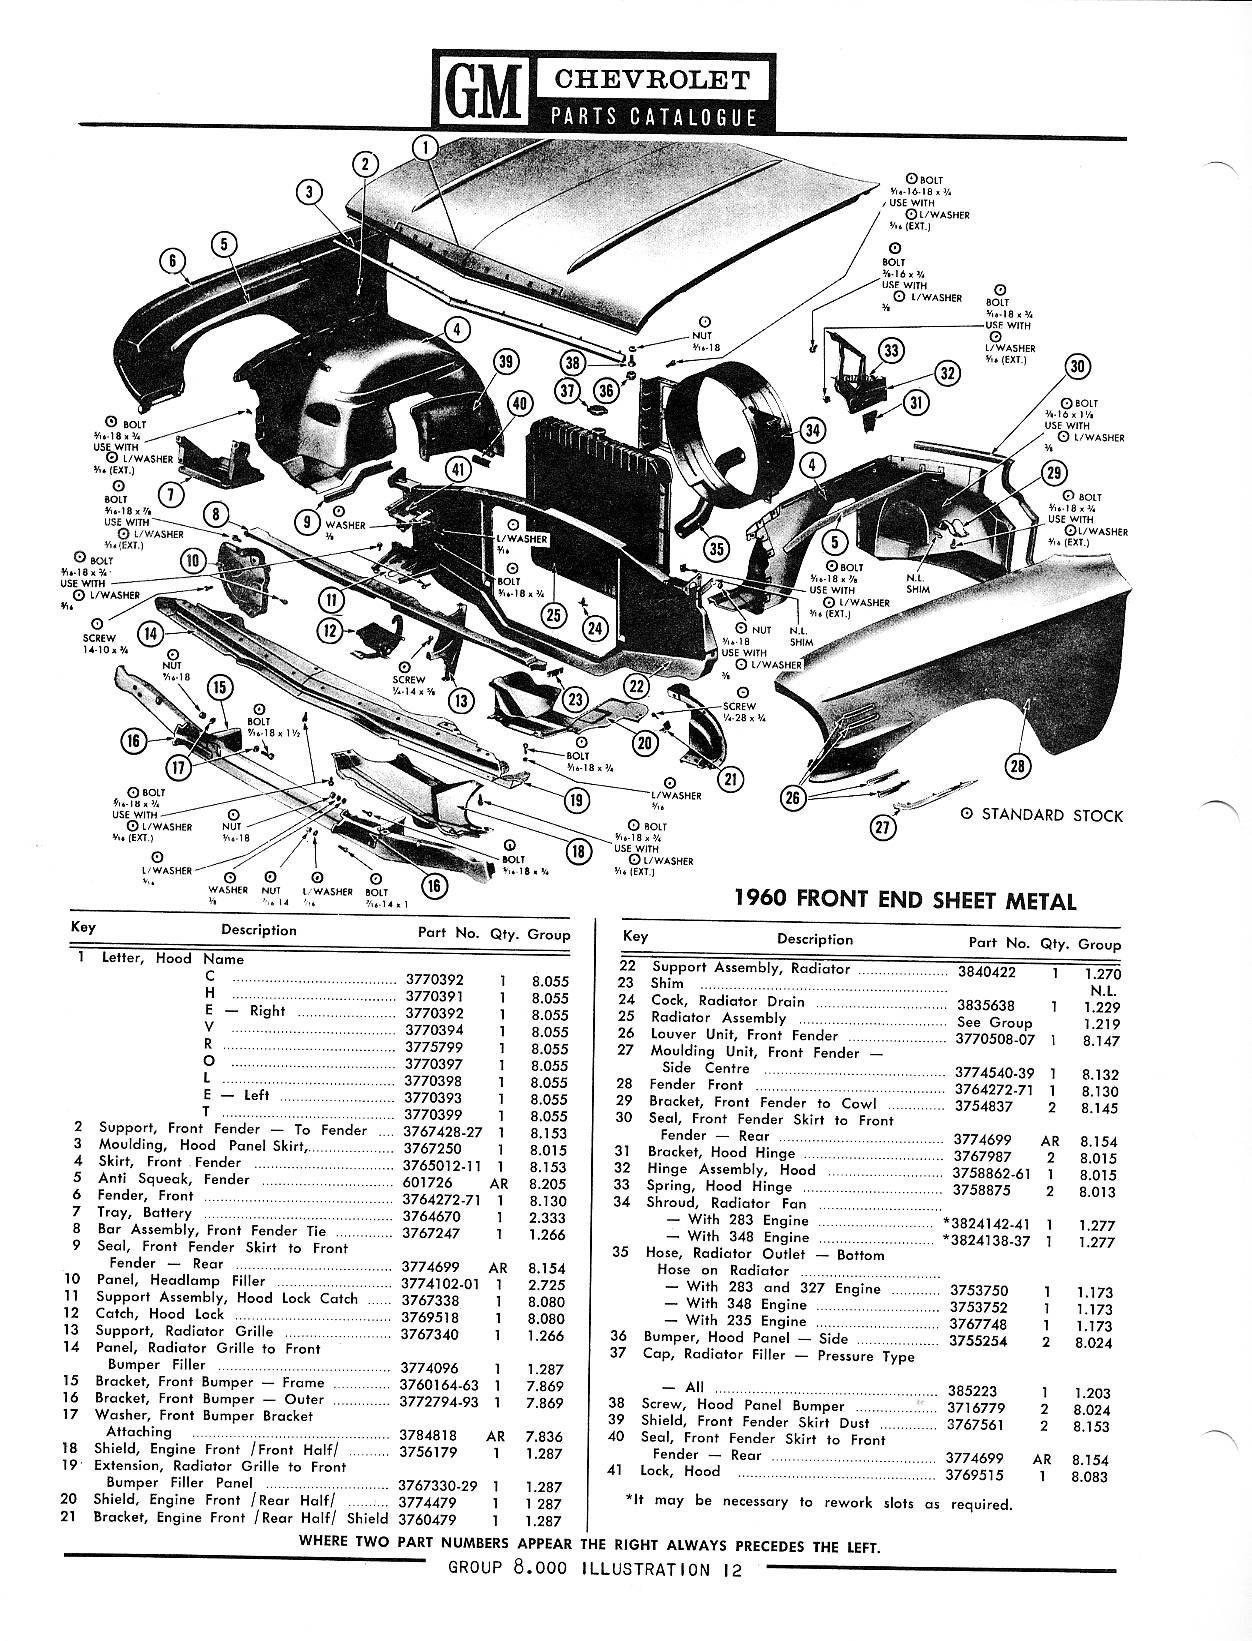 1958-1968 Chevrolet Parts Catalog / Image95.jpg